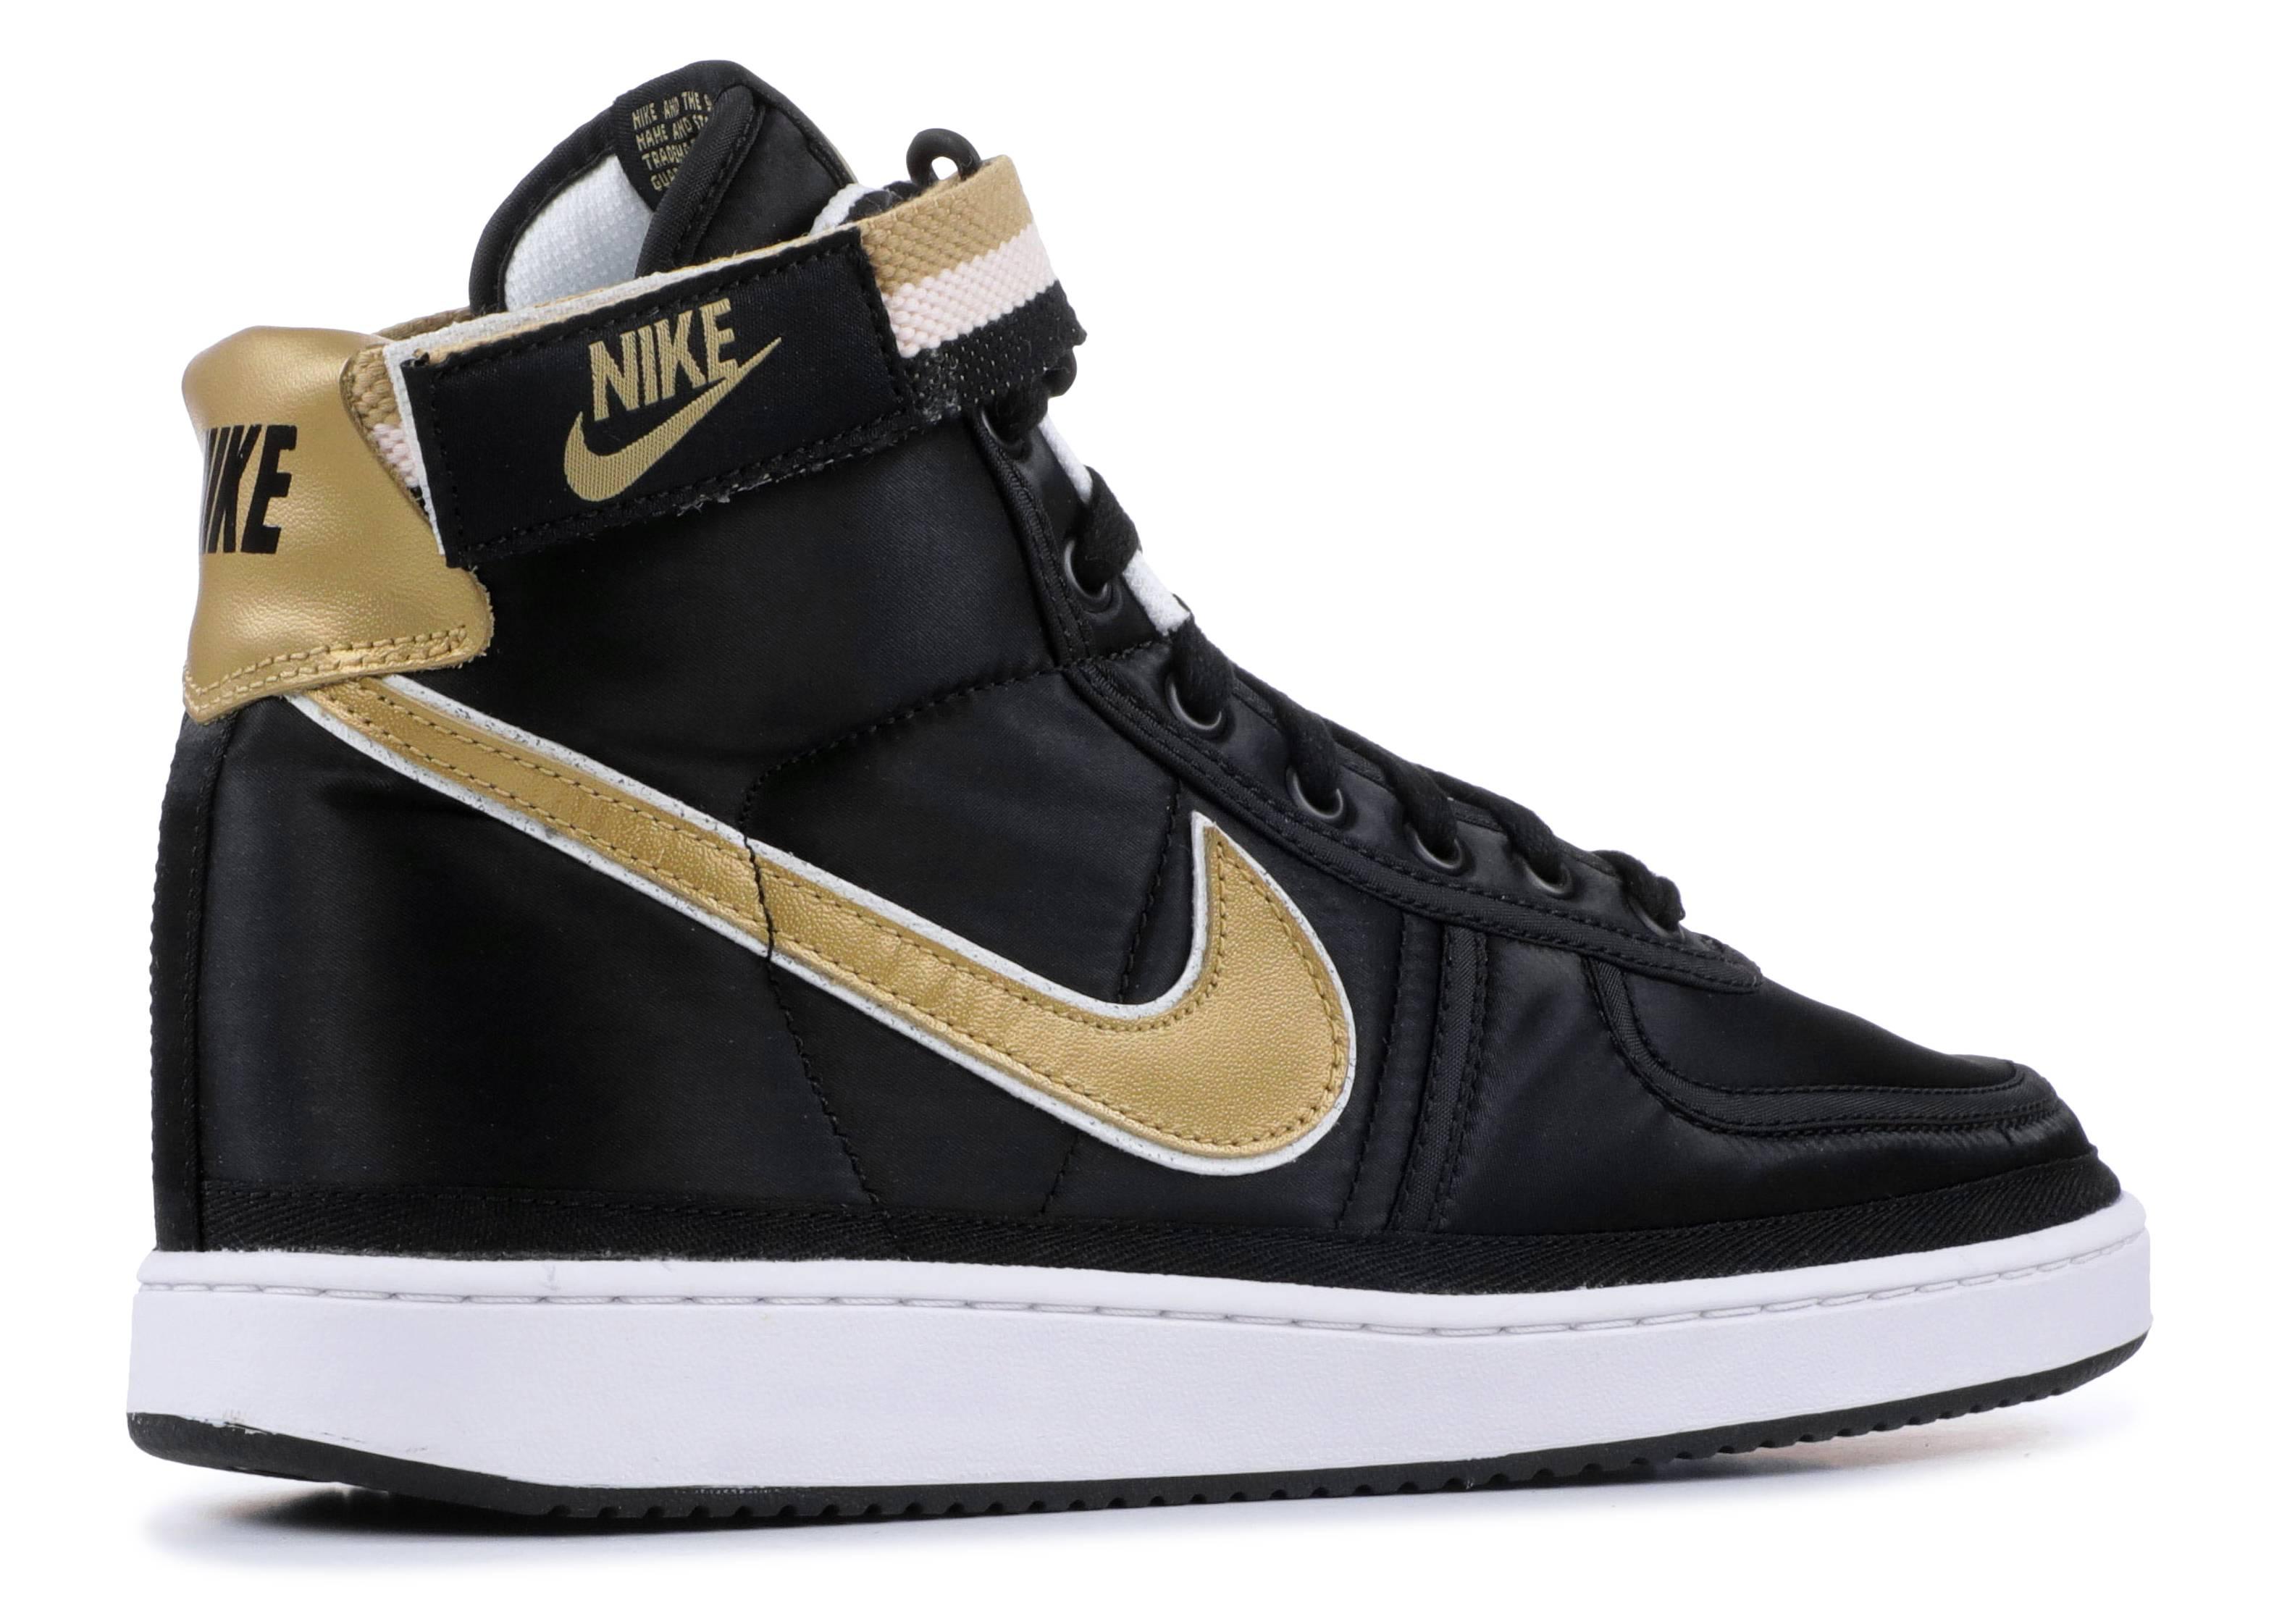 7e106a6b37a20a Nike Vandal High Supreme QS - Nike - AH8652 002 - black metallic gold-white